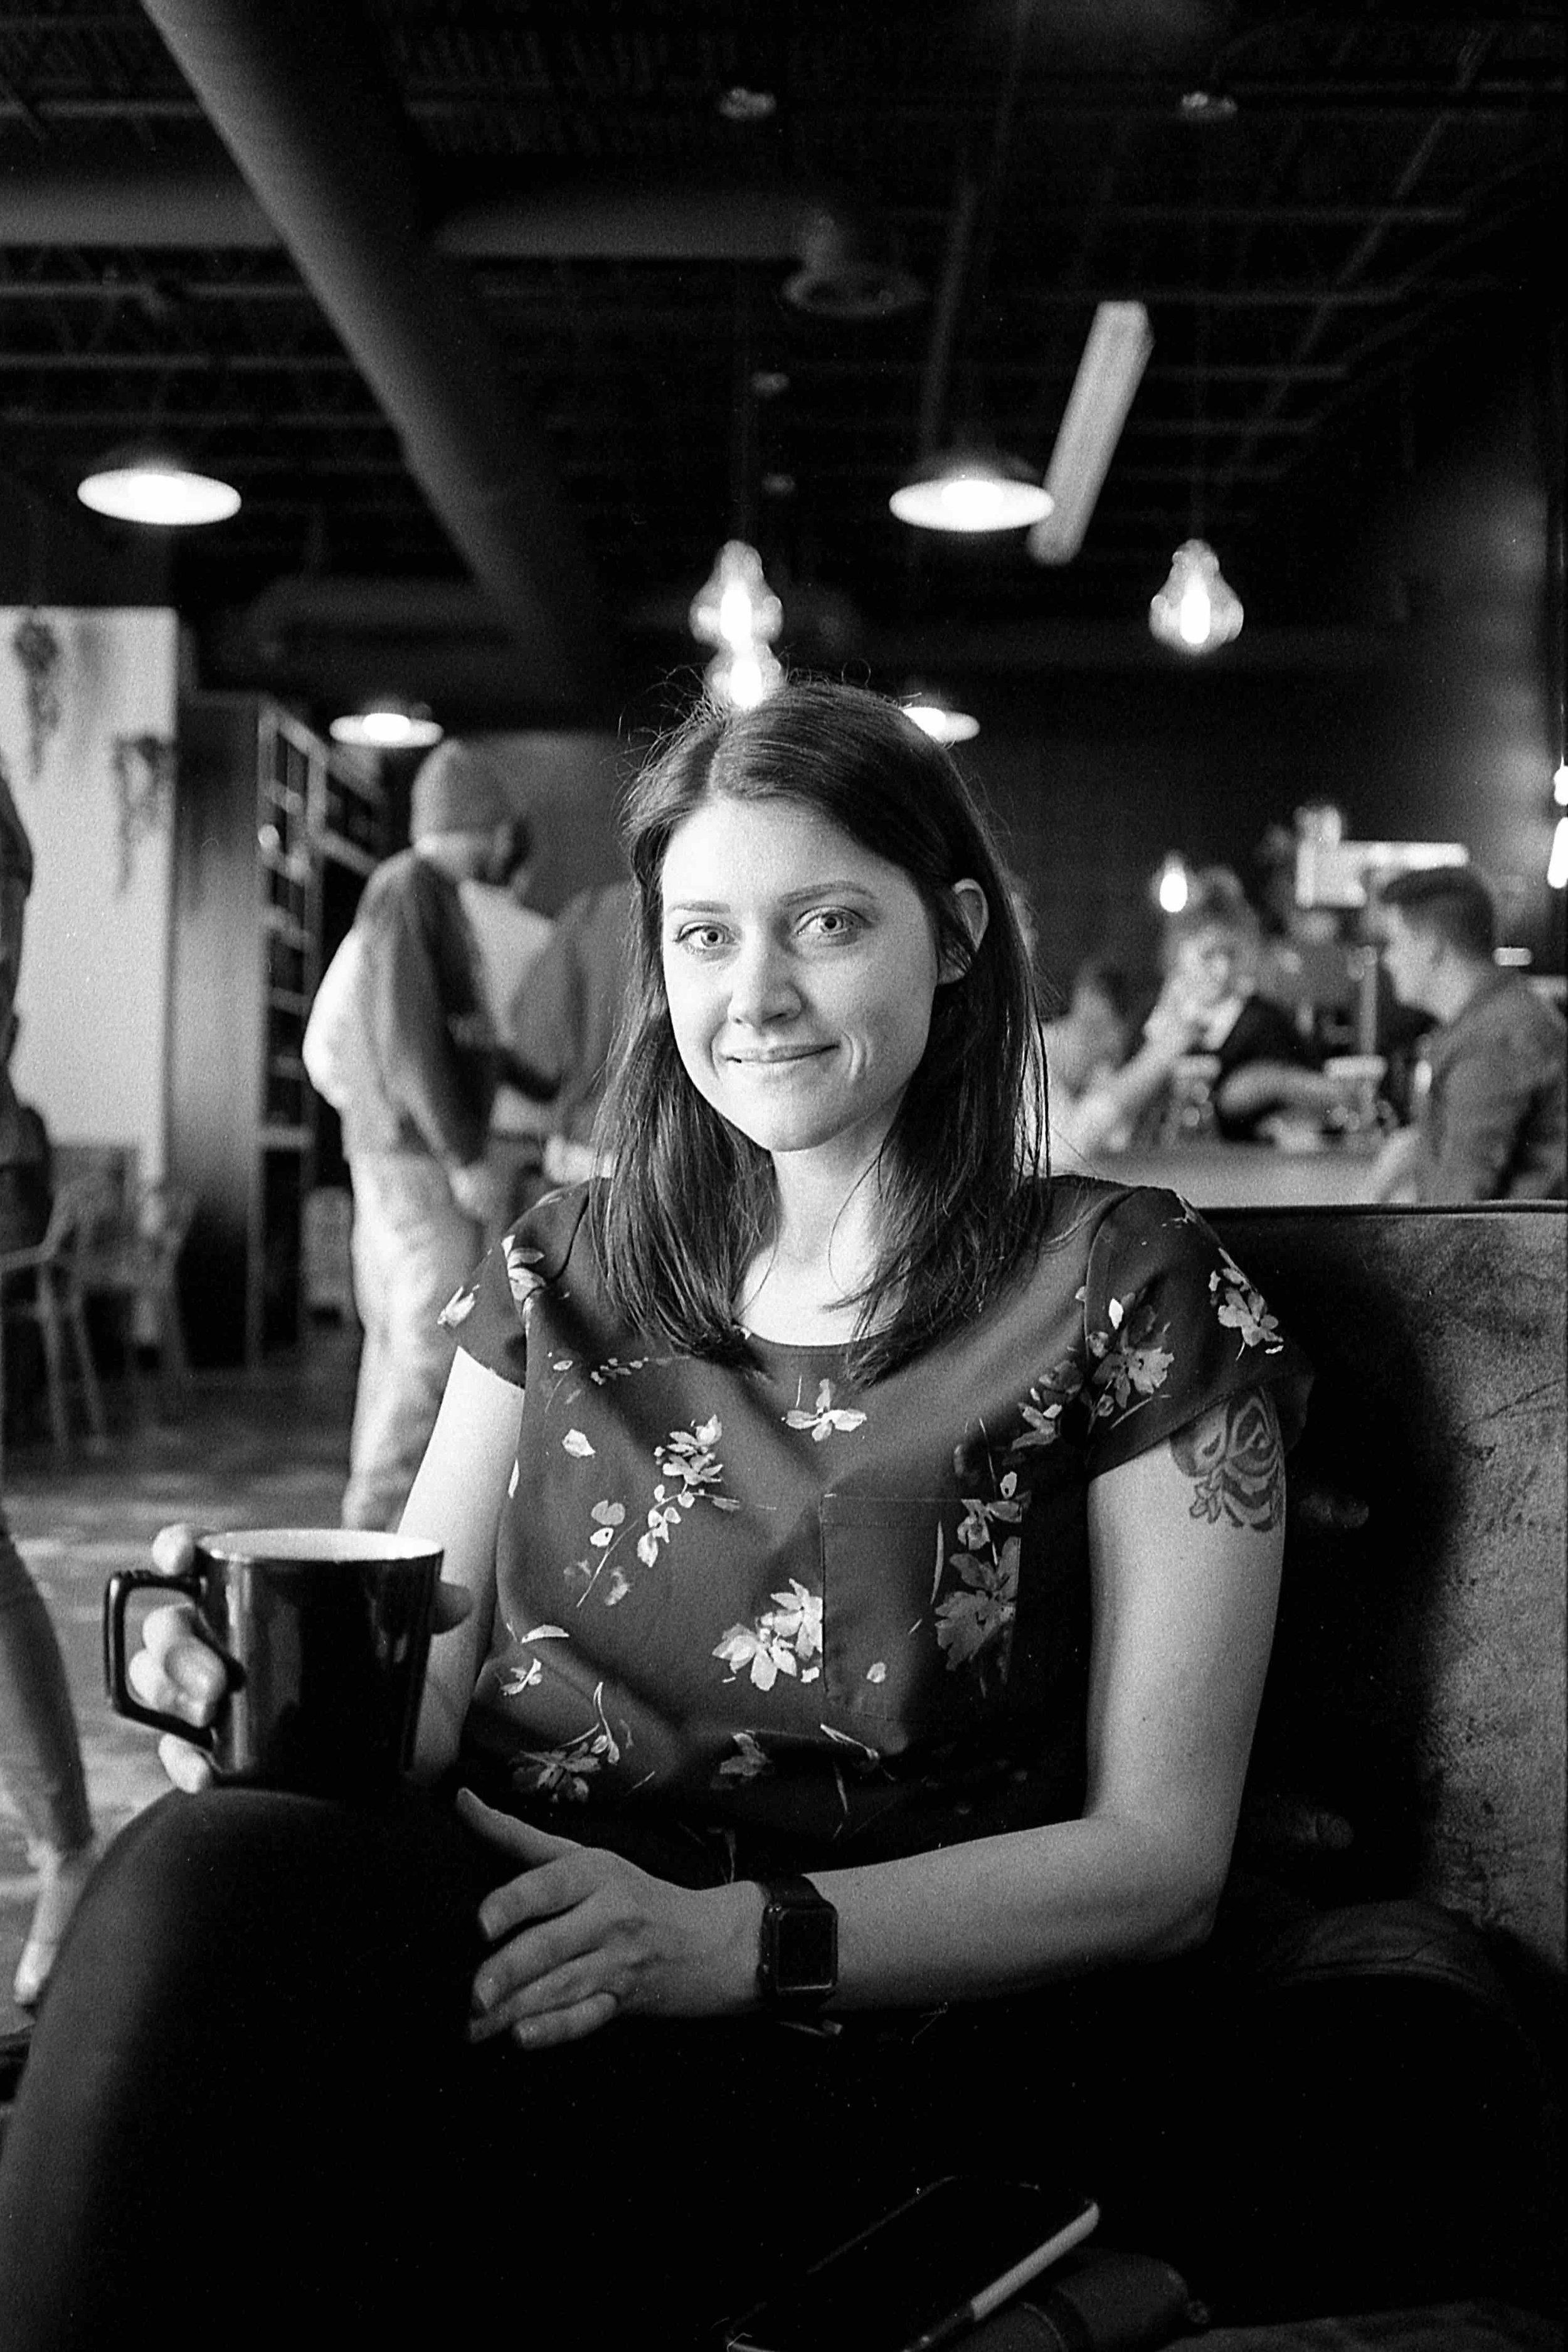 Matt Pittman / Offbeat Coffee Studio / Huntsville, Alabama / Leica M7 / Ilford HP5